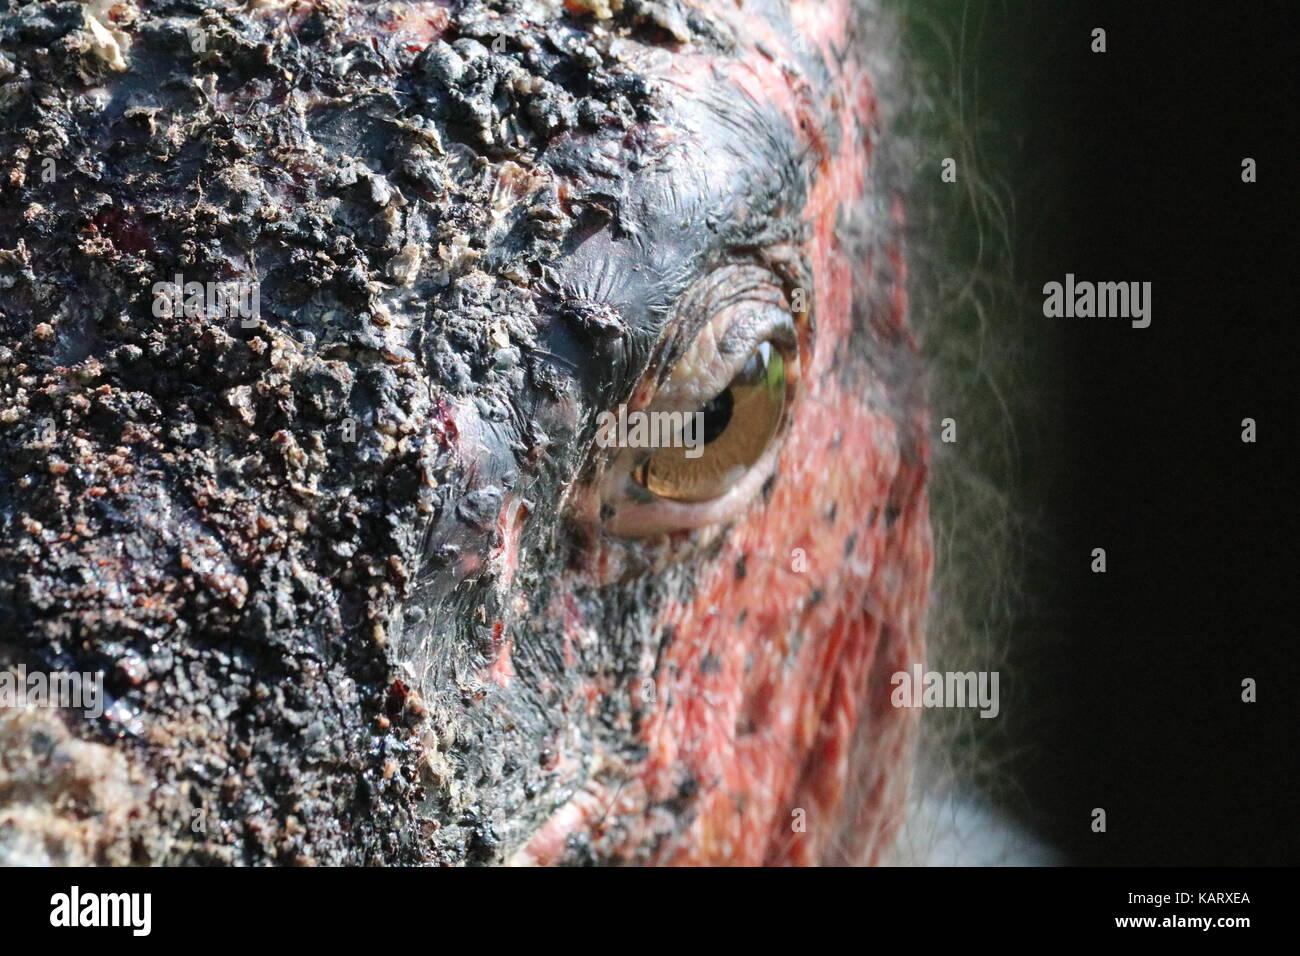 Extreme close-up von Marabu - Sweetwaters - Ol Pejeta Conservancy - Kenia Stockbild